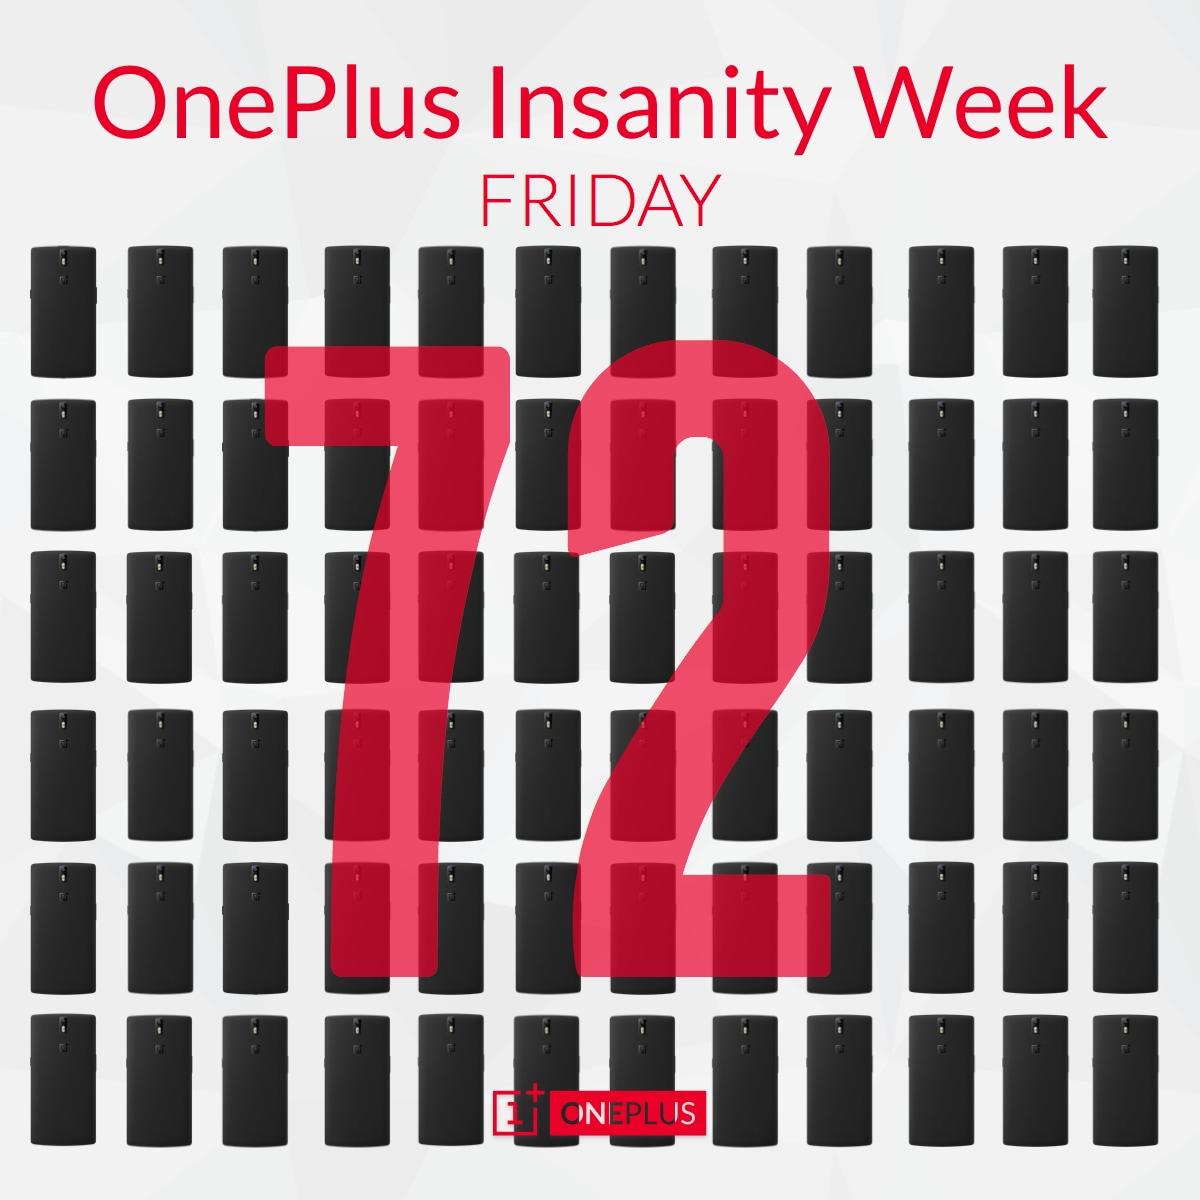 OnePlus Insanity Week giorno 5, in regalo ben 72 OnePlus One: ecco come partecipare!